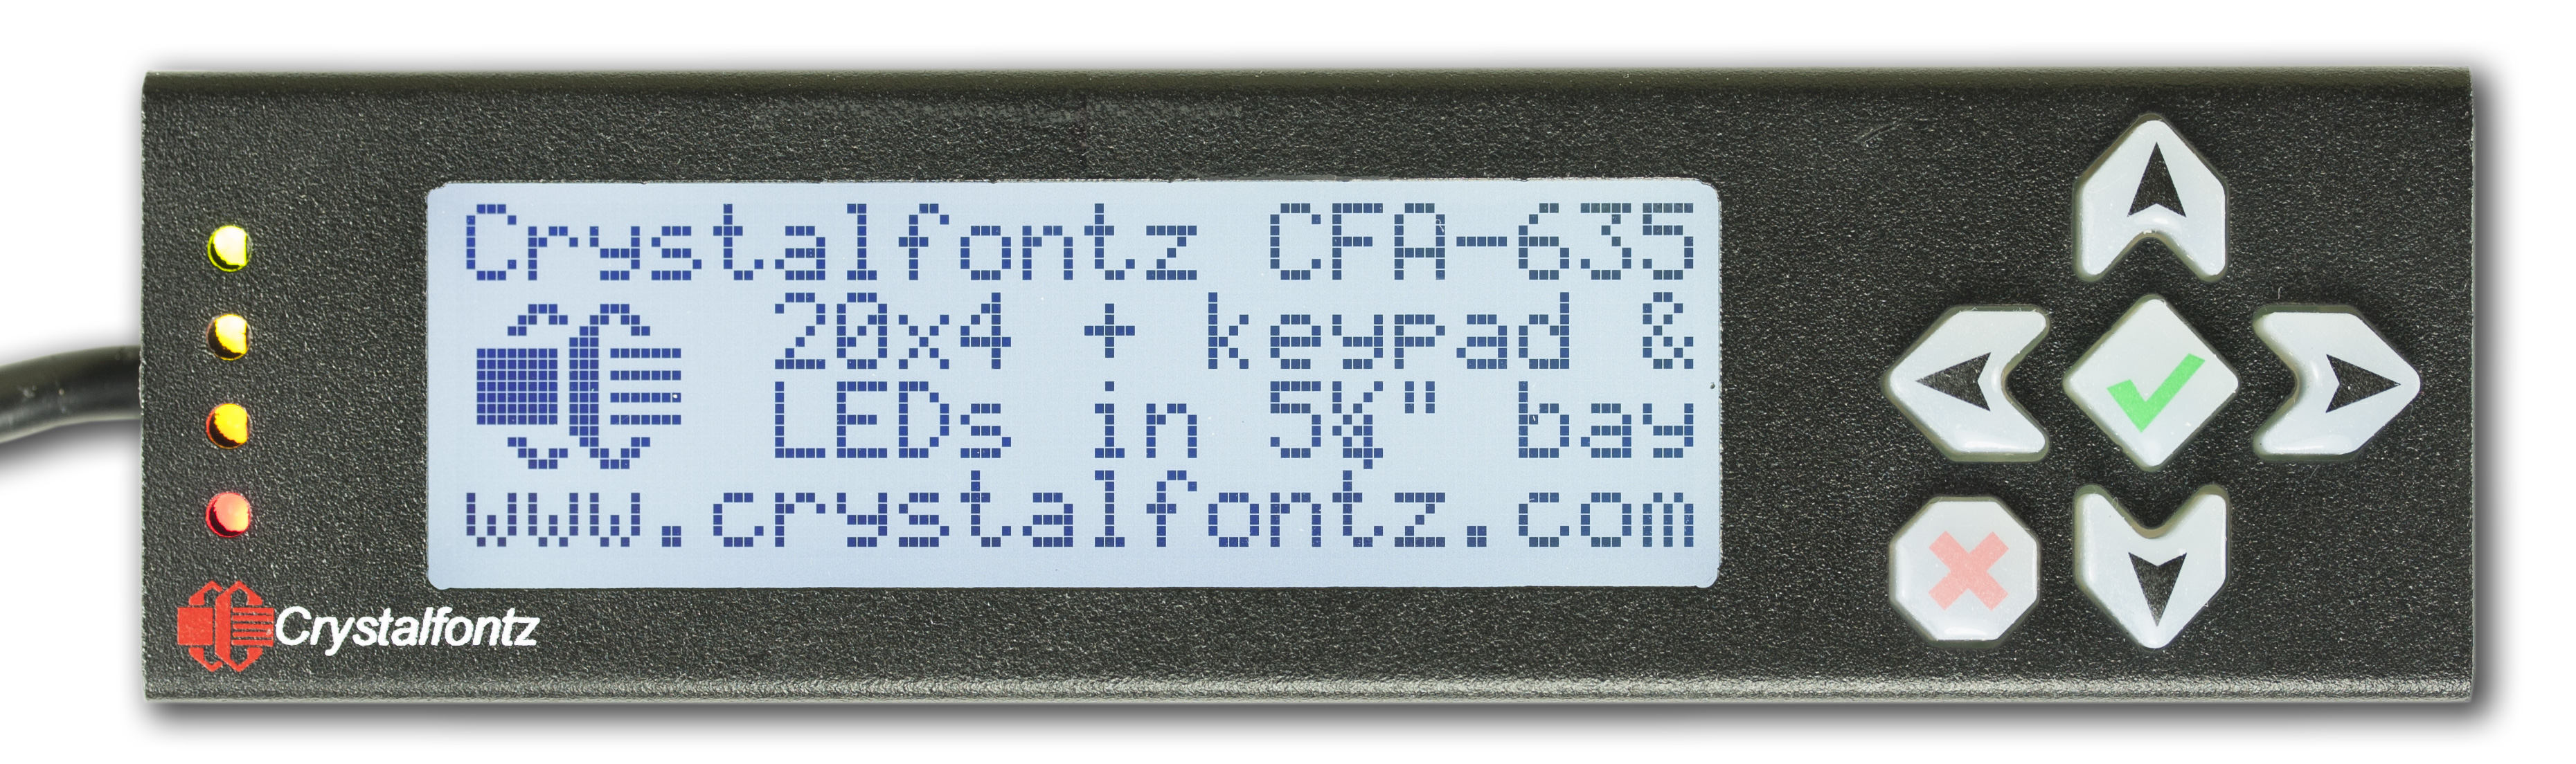 20x4 USB LCD Display in Steel Enclosure Black on Gray